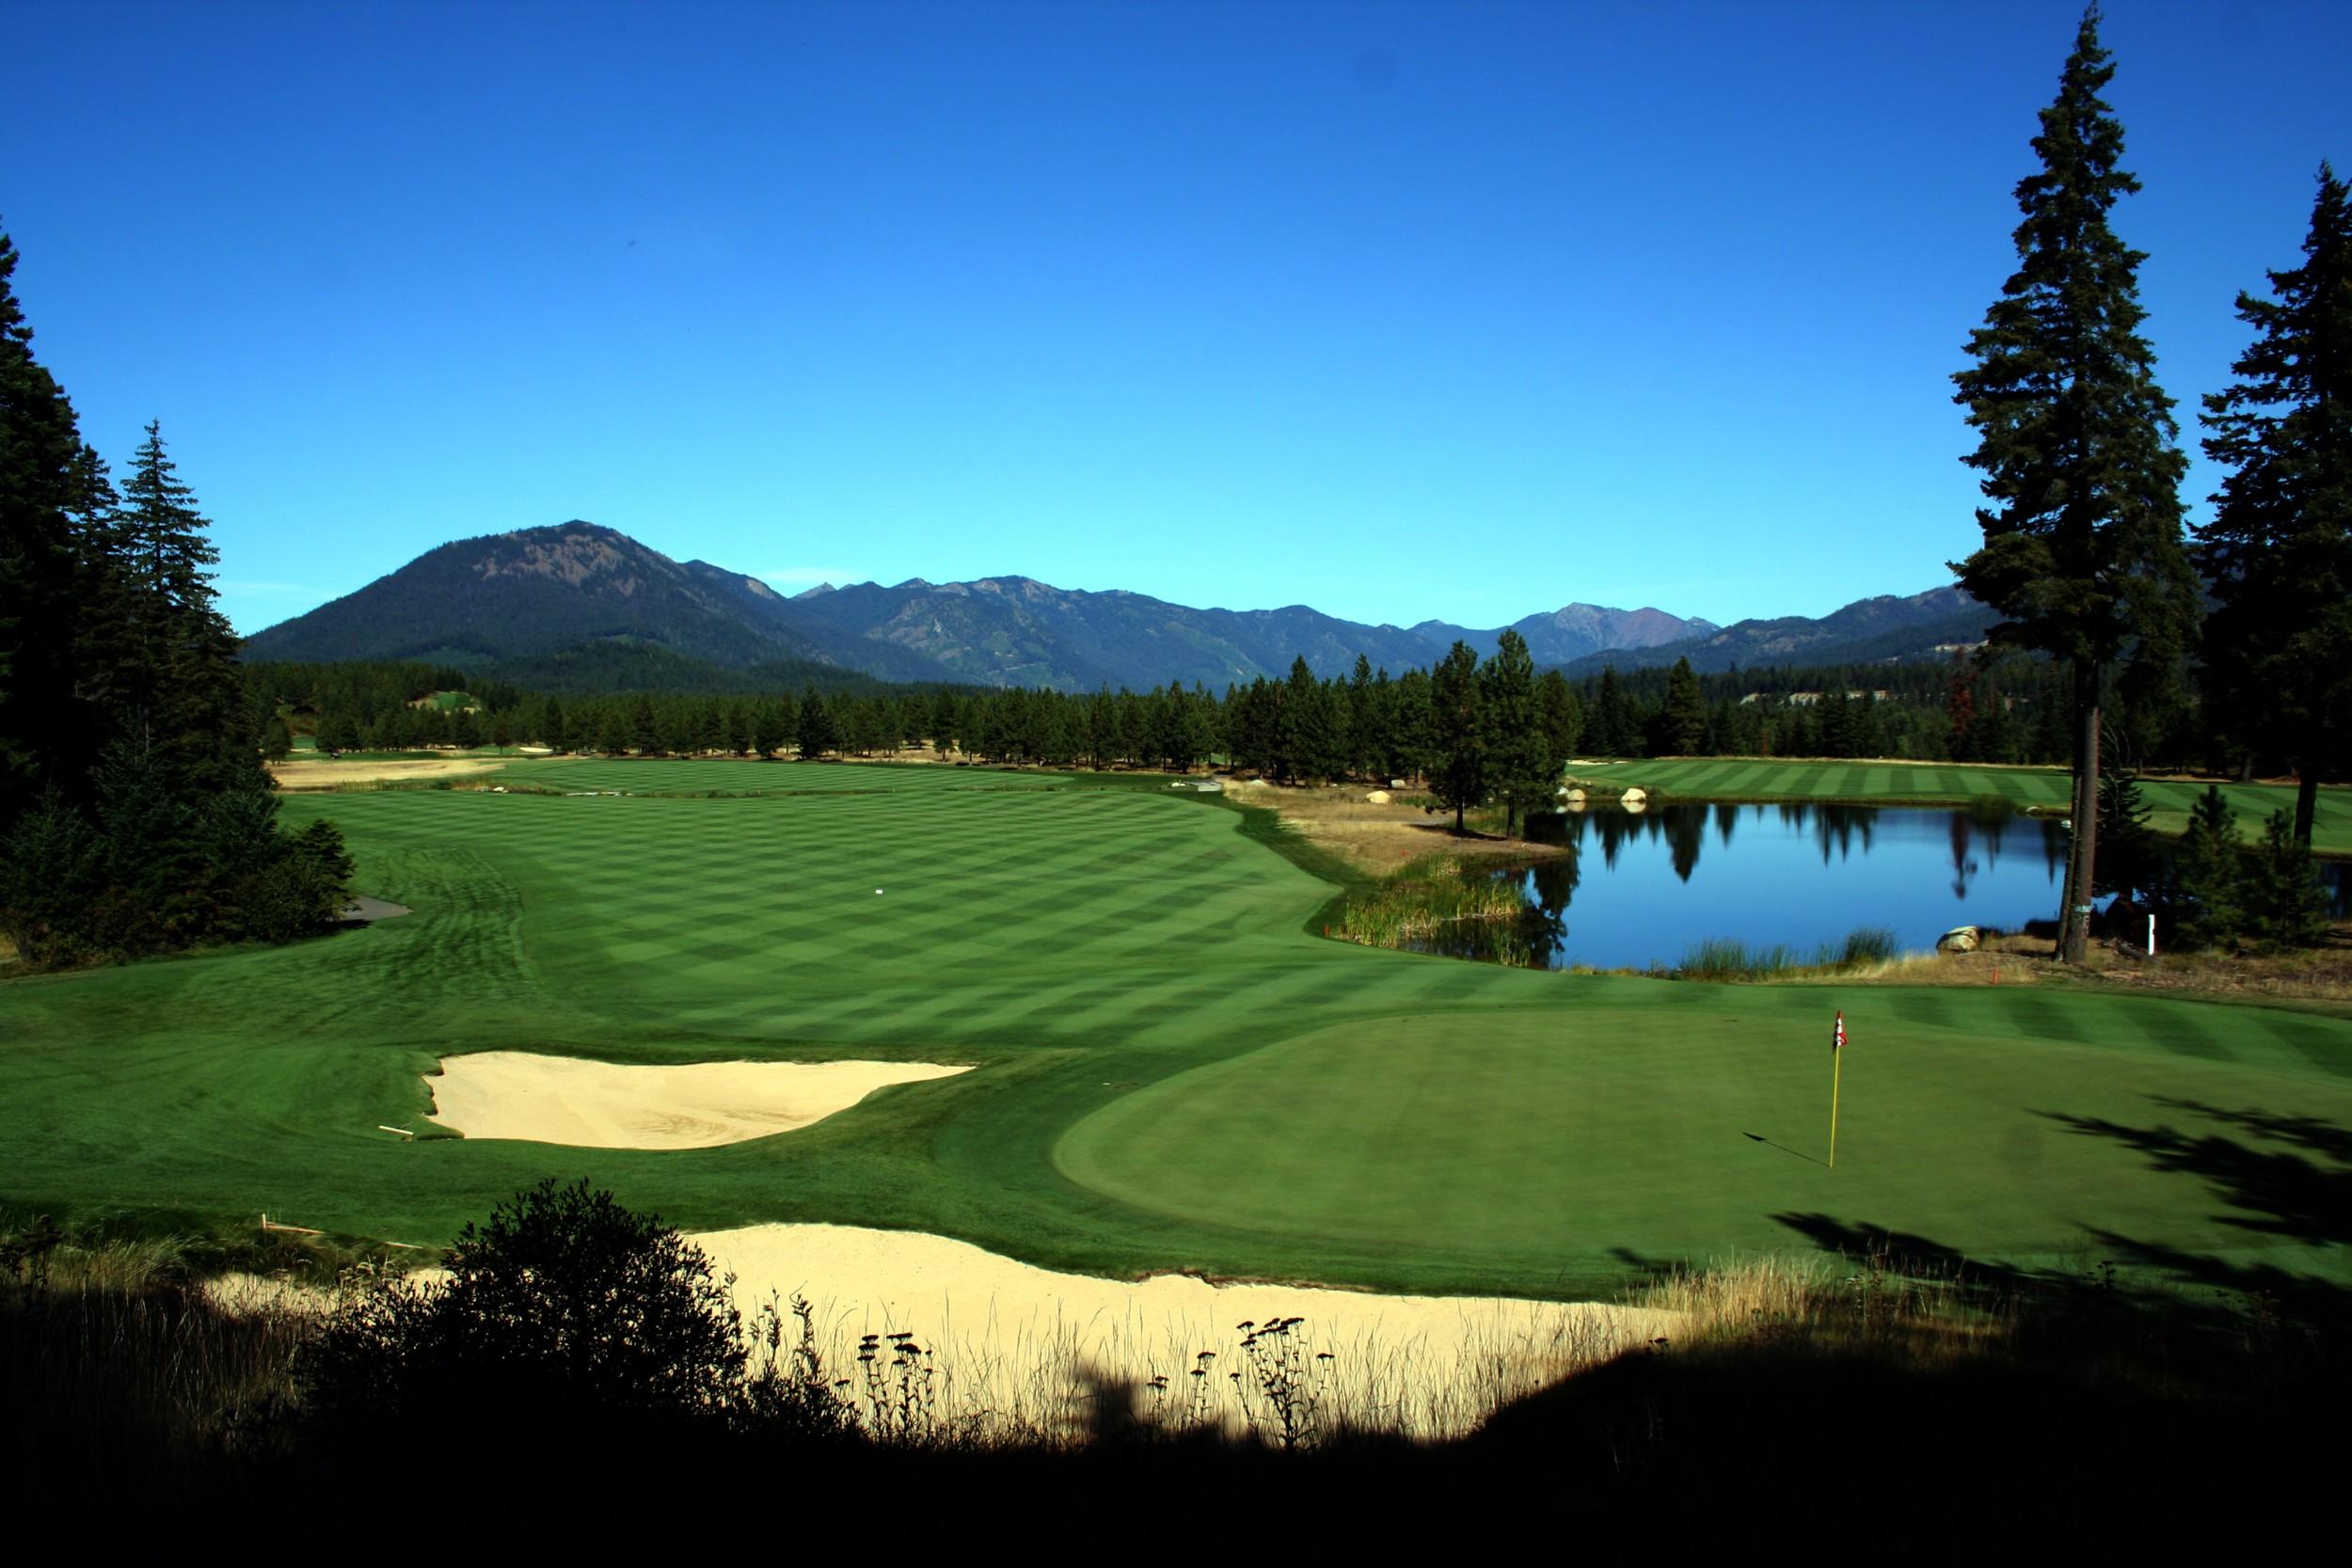 Casino golf courses in washington